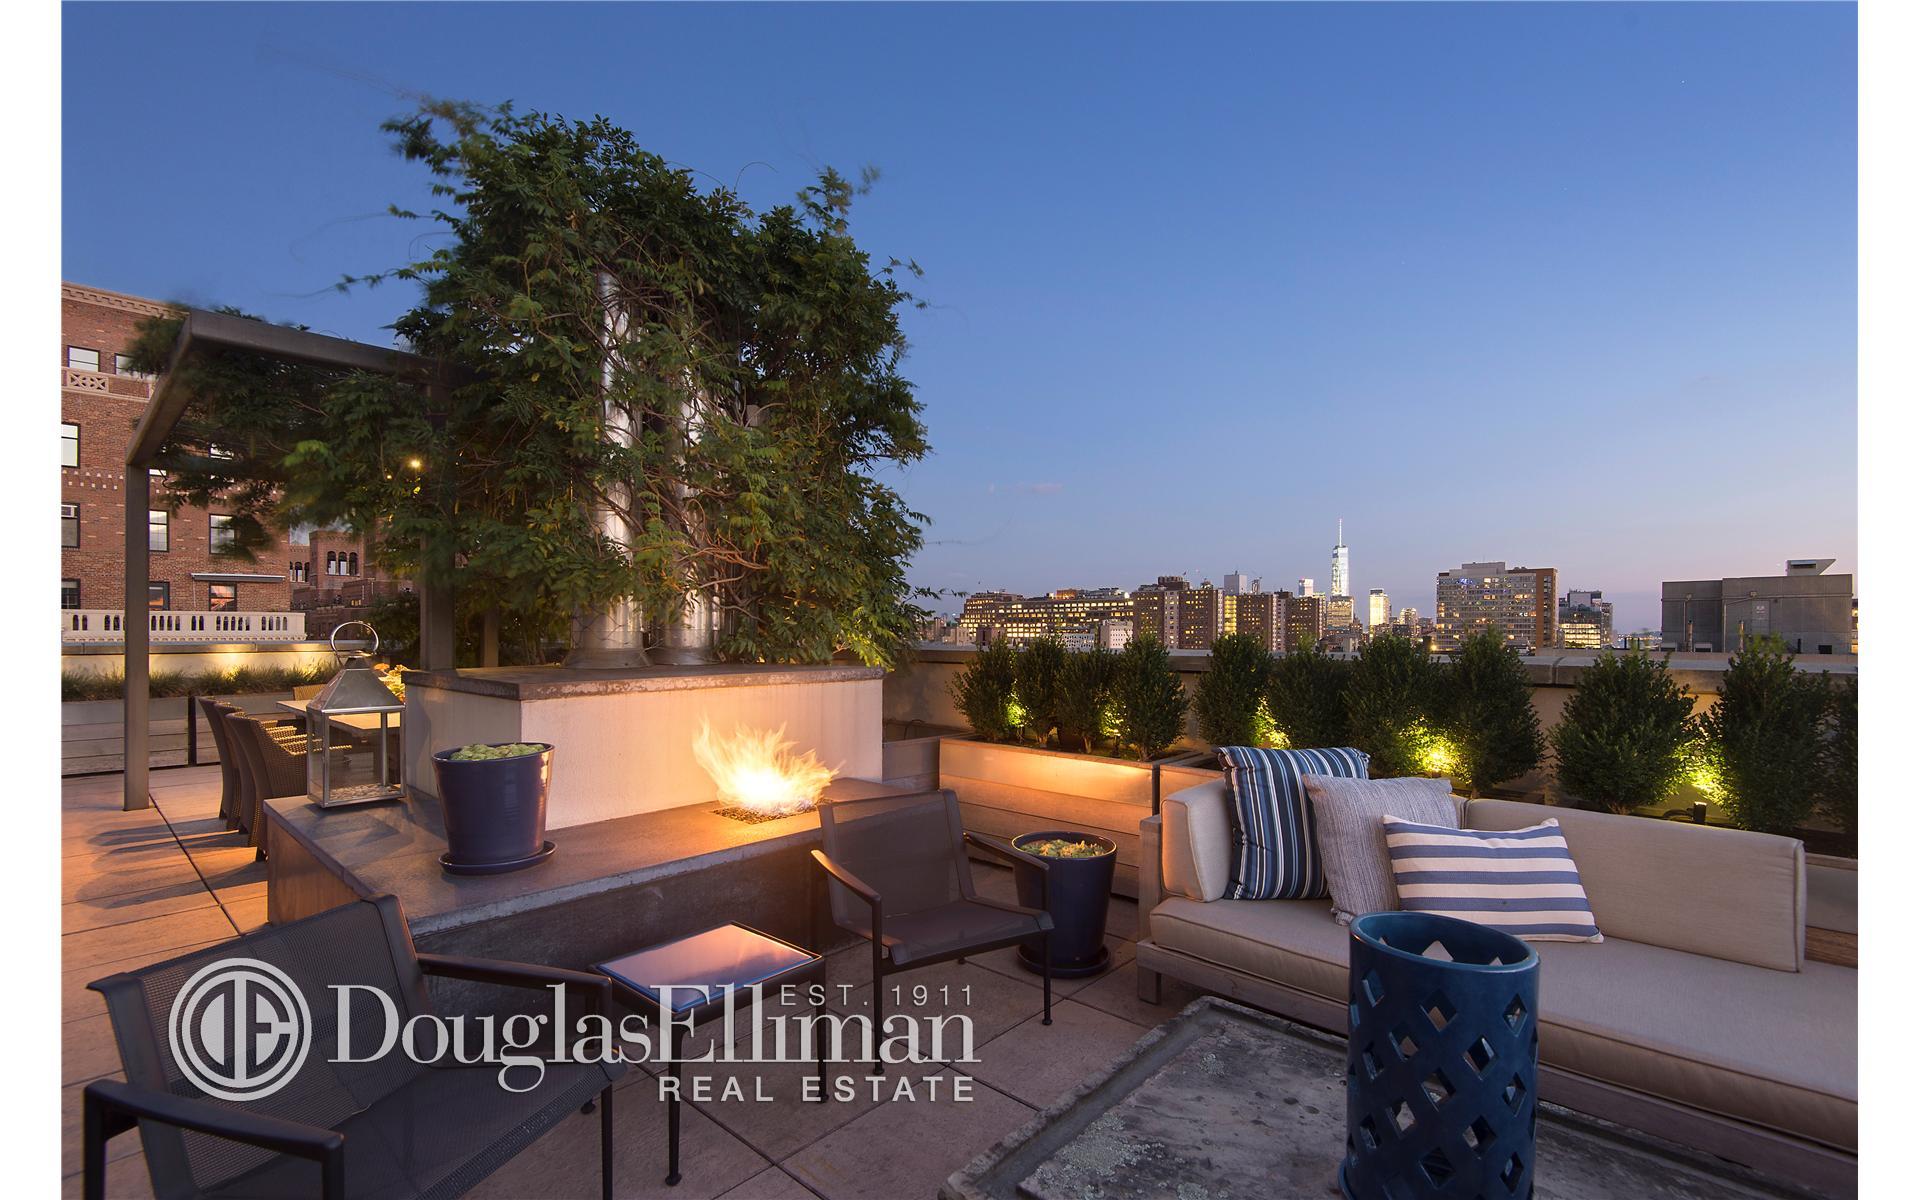 Condominium for Sale at VESTA 24, Vesta 24, 231 Tenth Avenue New York, New York 10001 United States